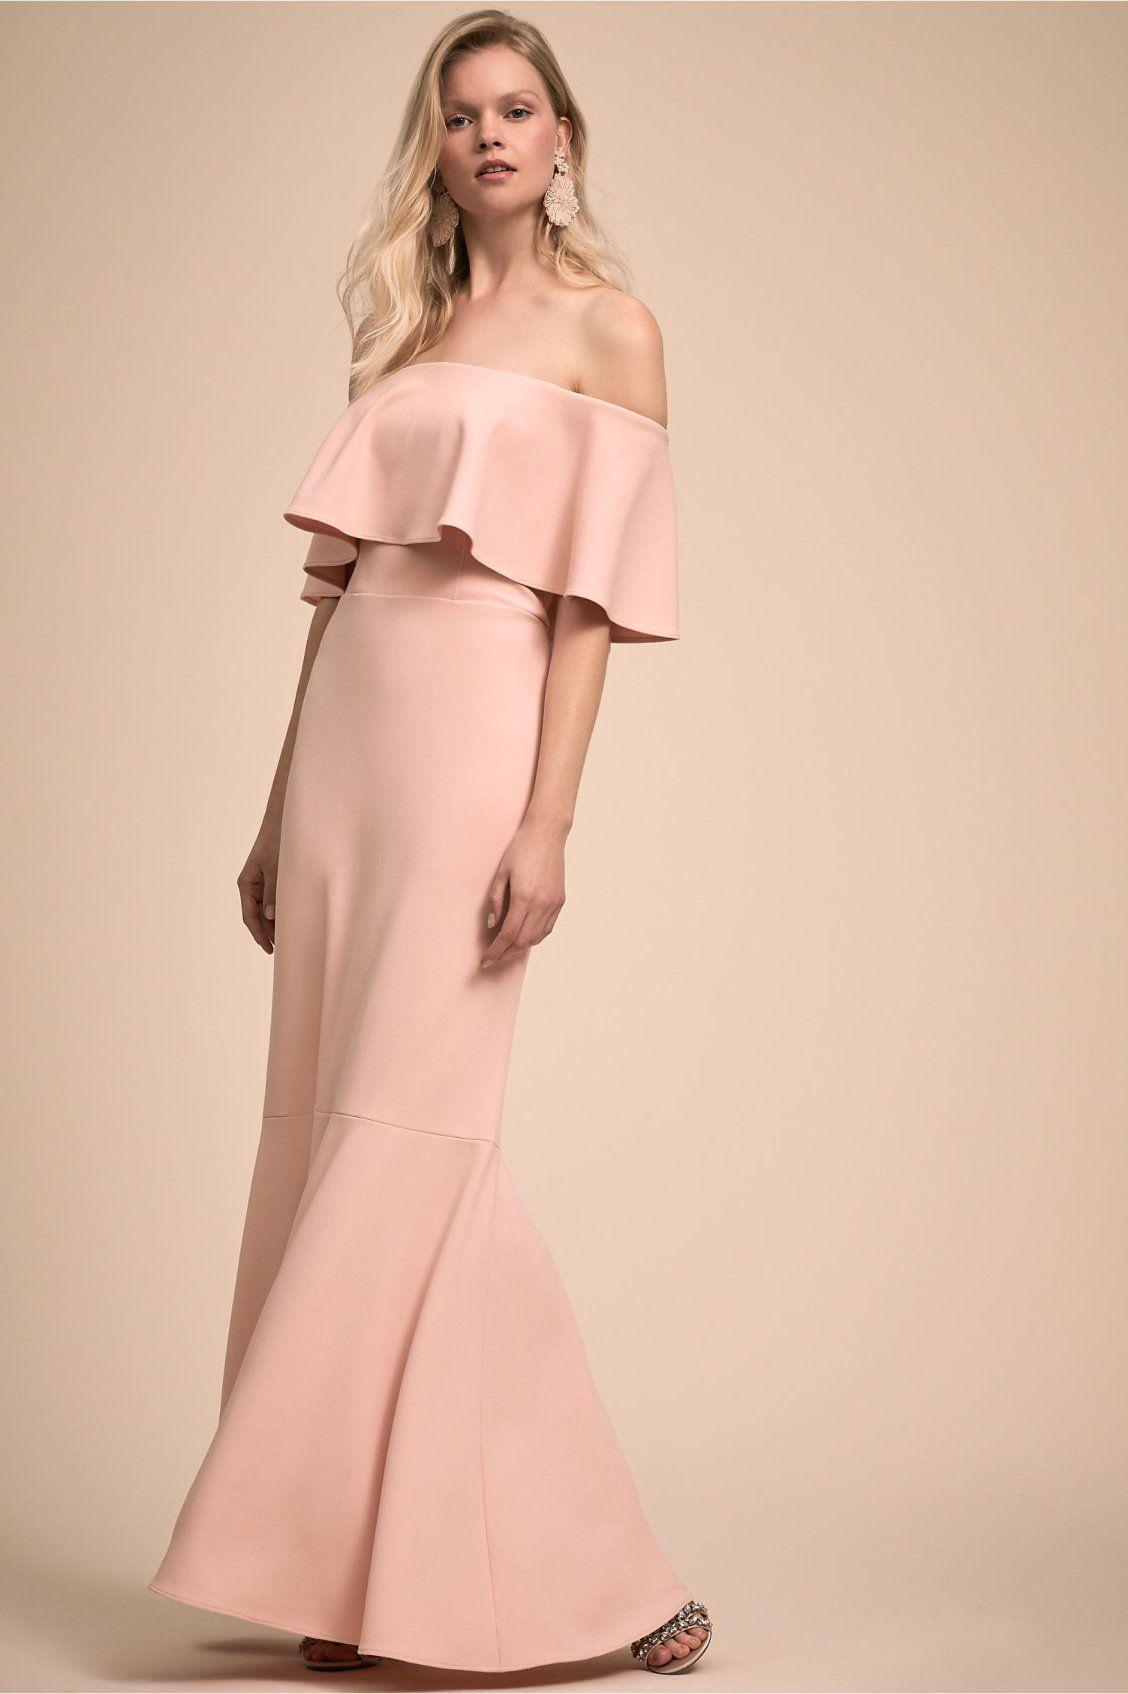 Lemon bridesmaid dresses uk | Lola bridesmaid dress | Pure